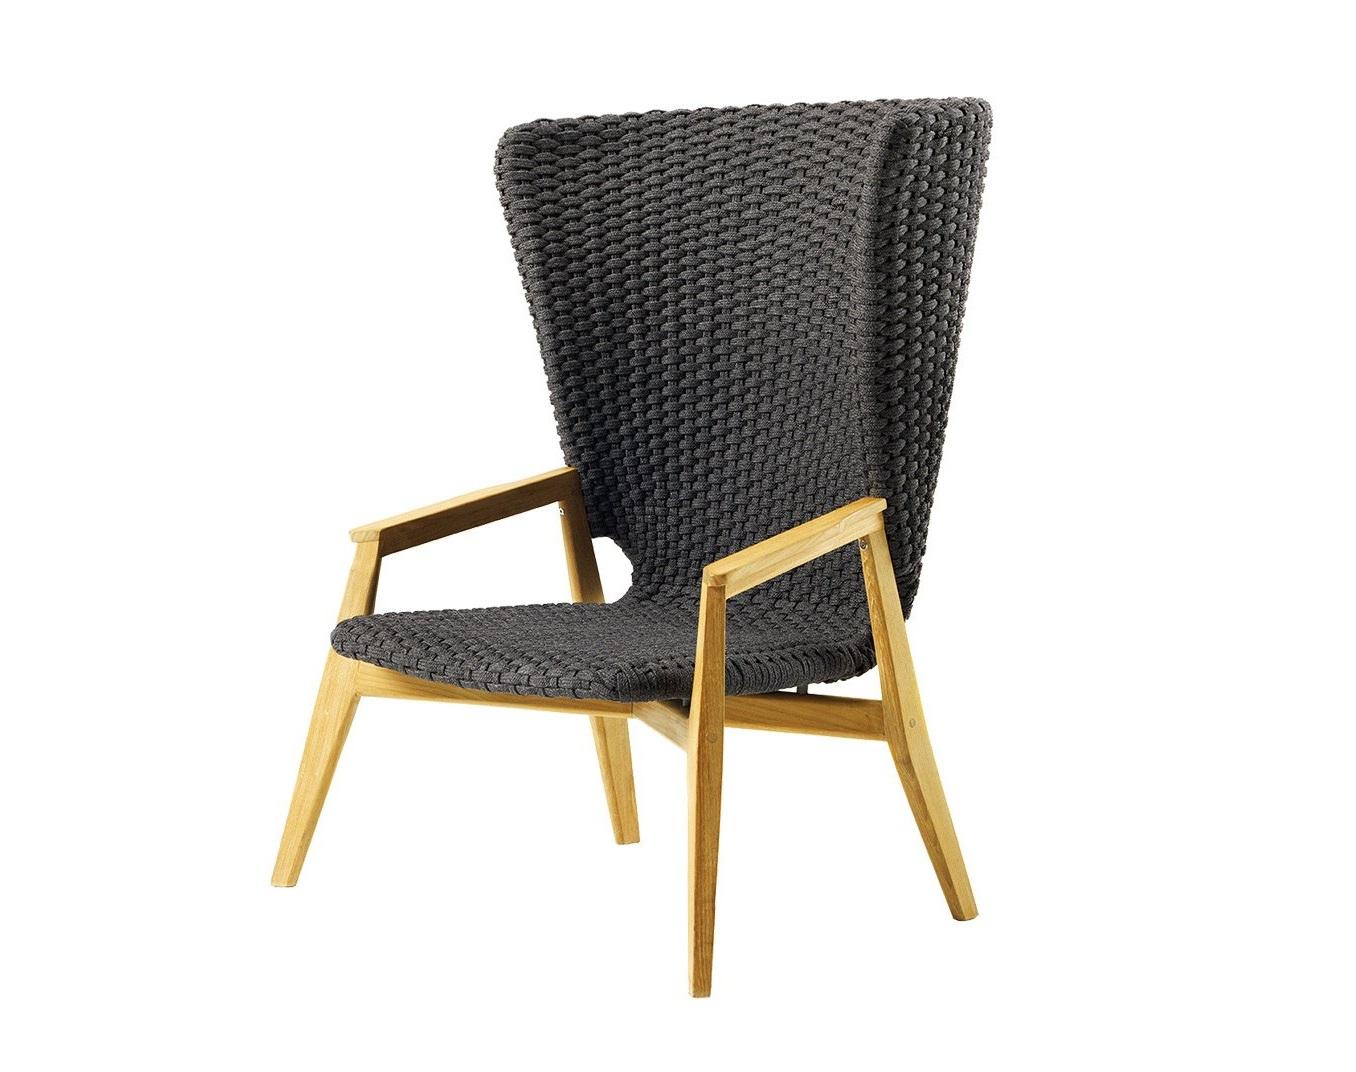 Подвесное кресло ETHIMO 15444843 от thefurnish